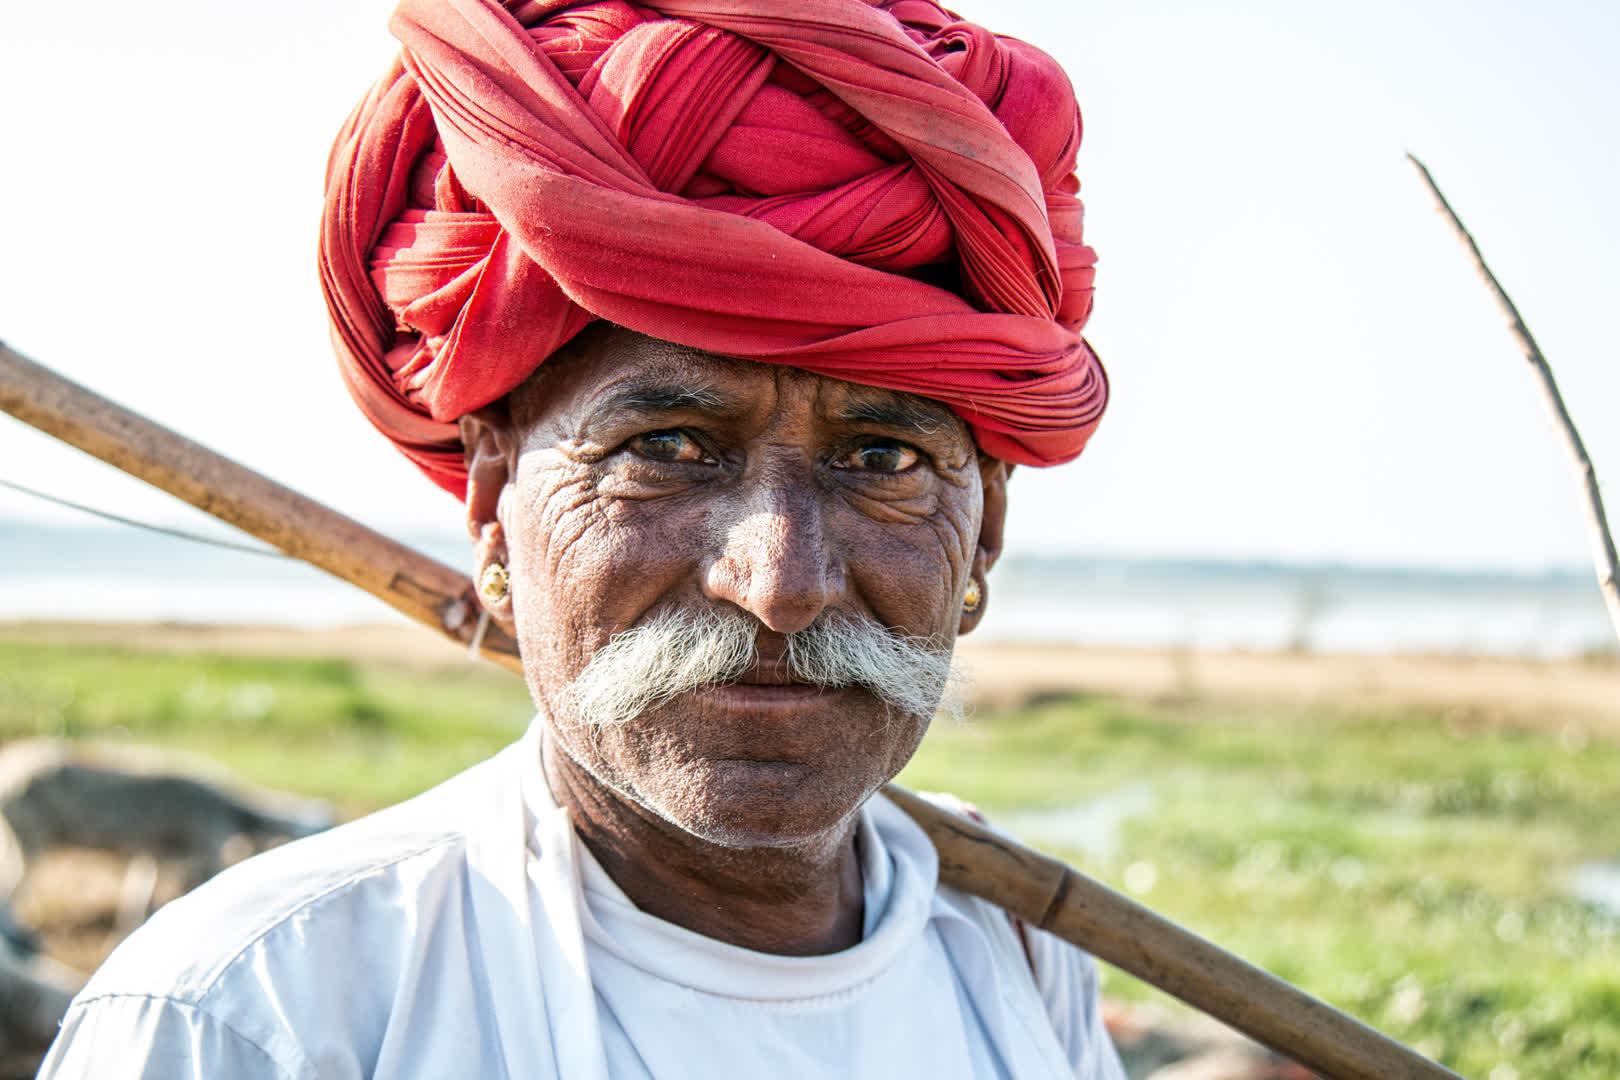 A member of the Rabari Tribe wearing a turban